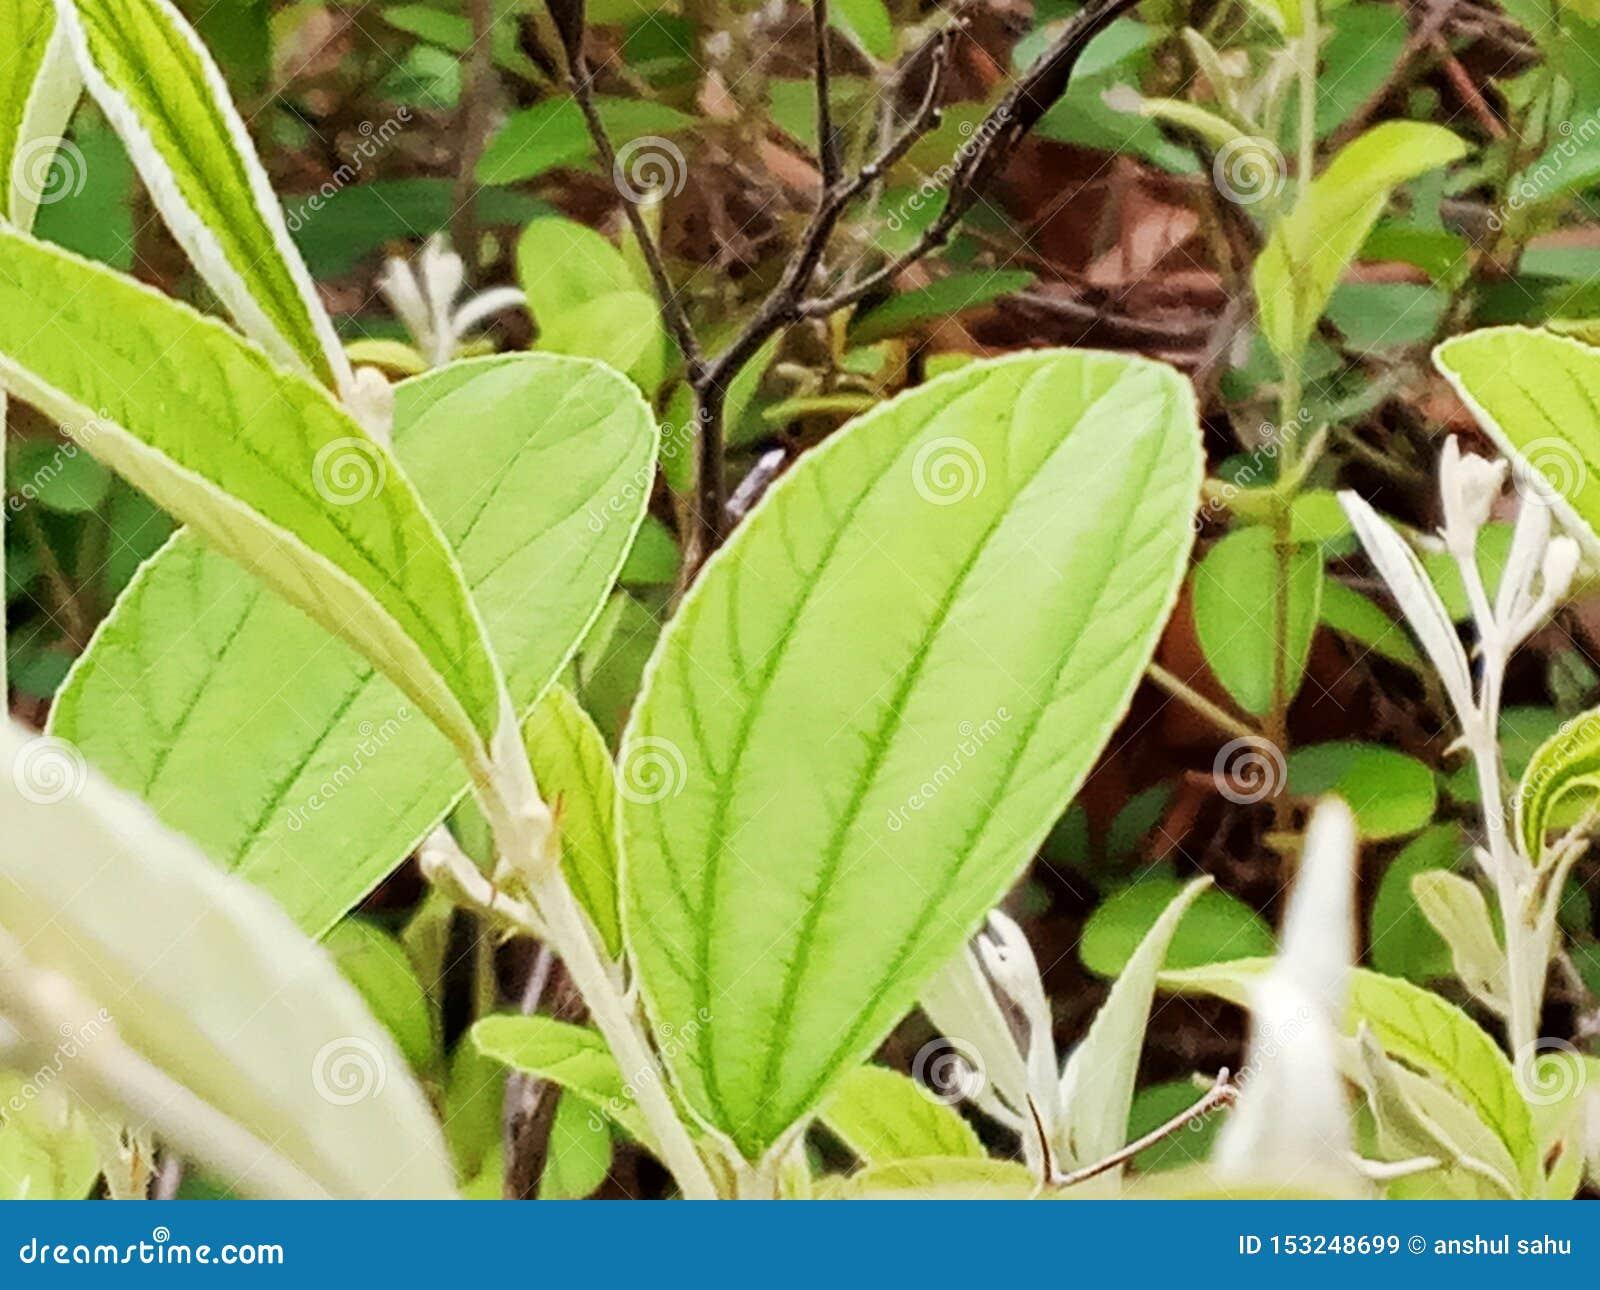 Leaves natural bilar plant bright